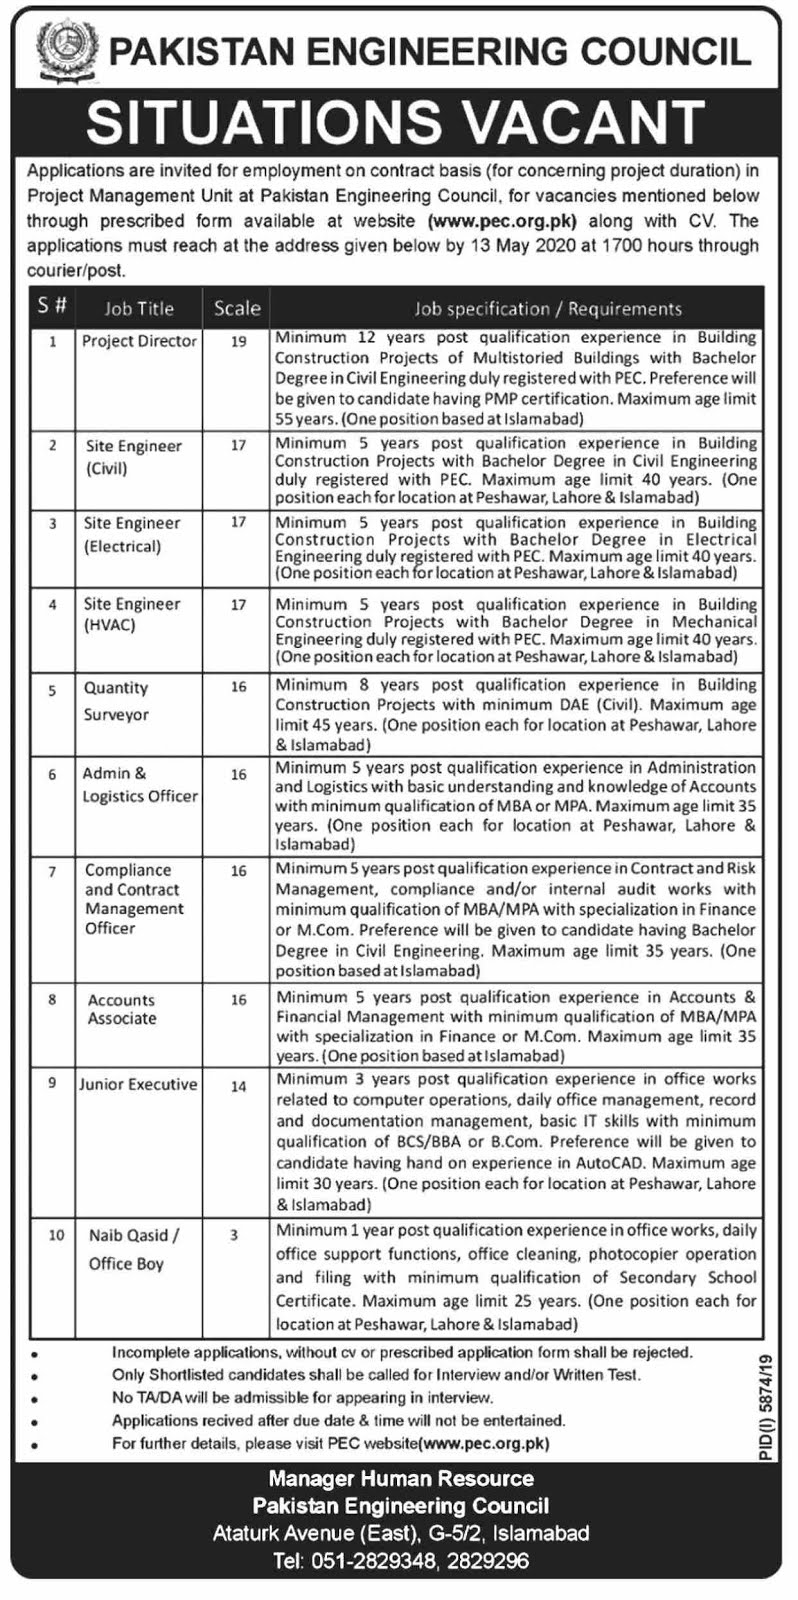 Pakistan Engineering Council Jobs May 2020